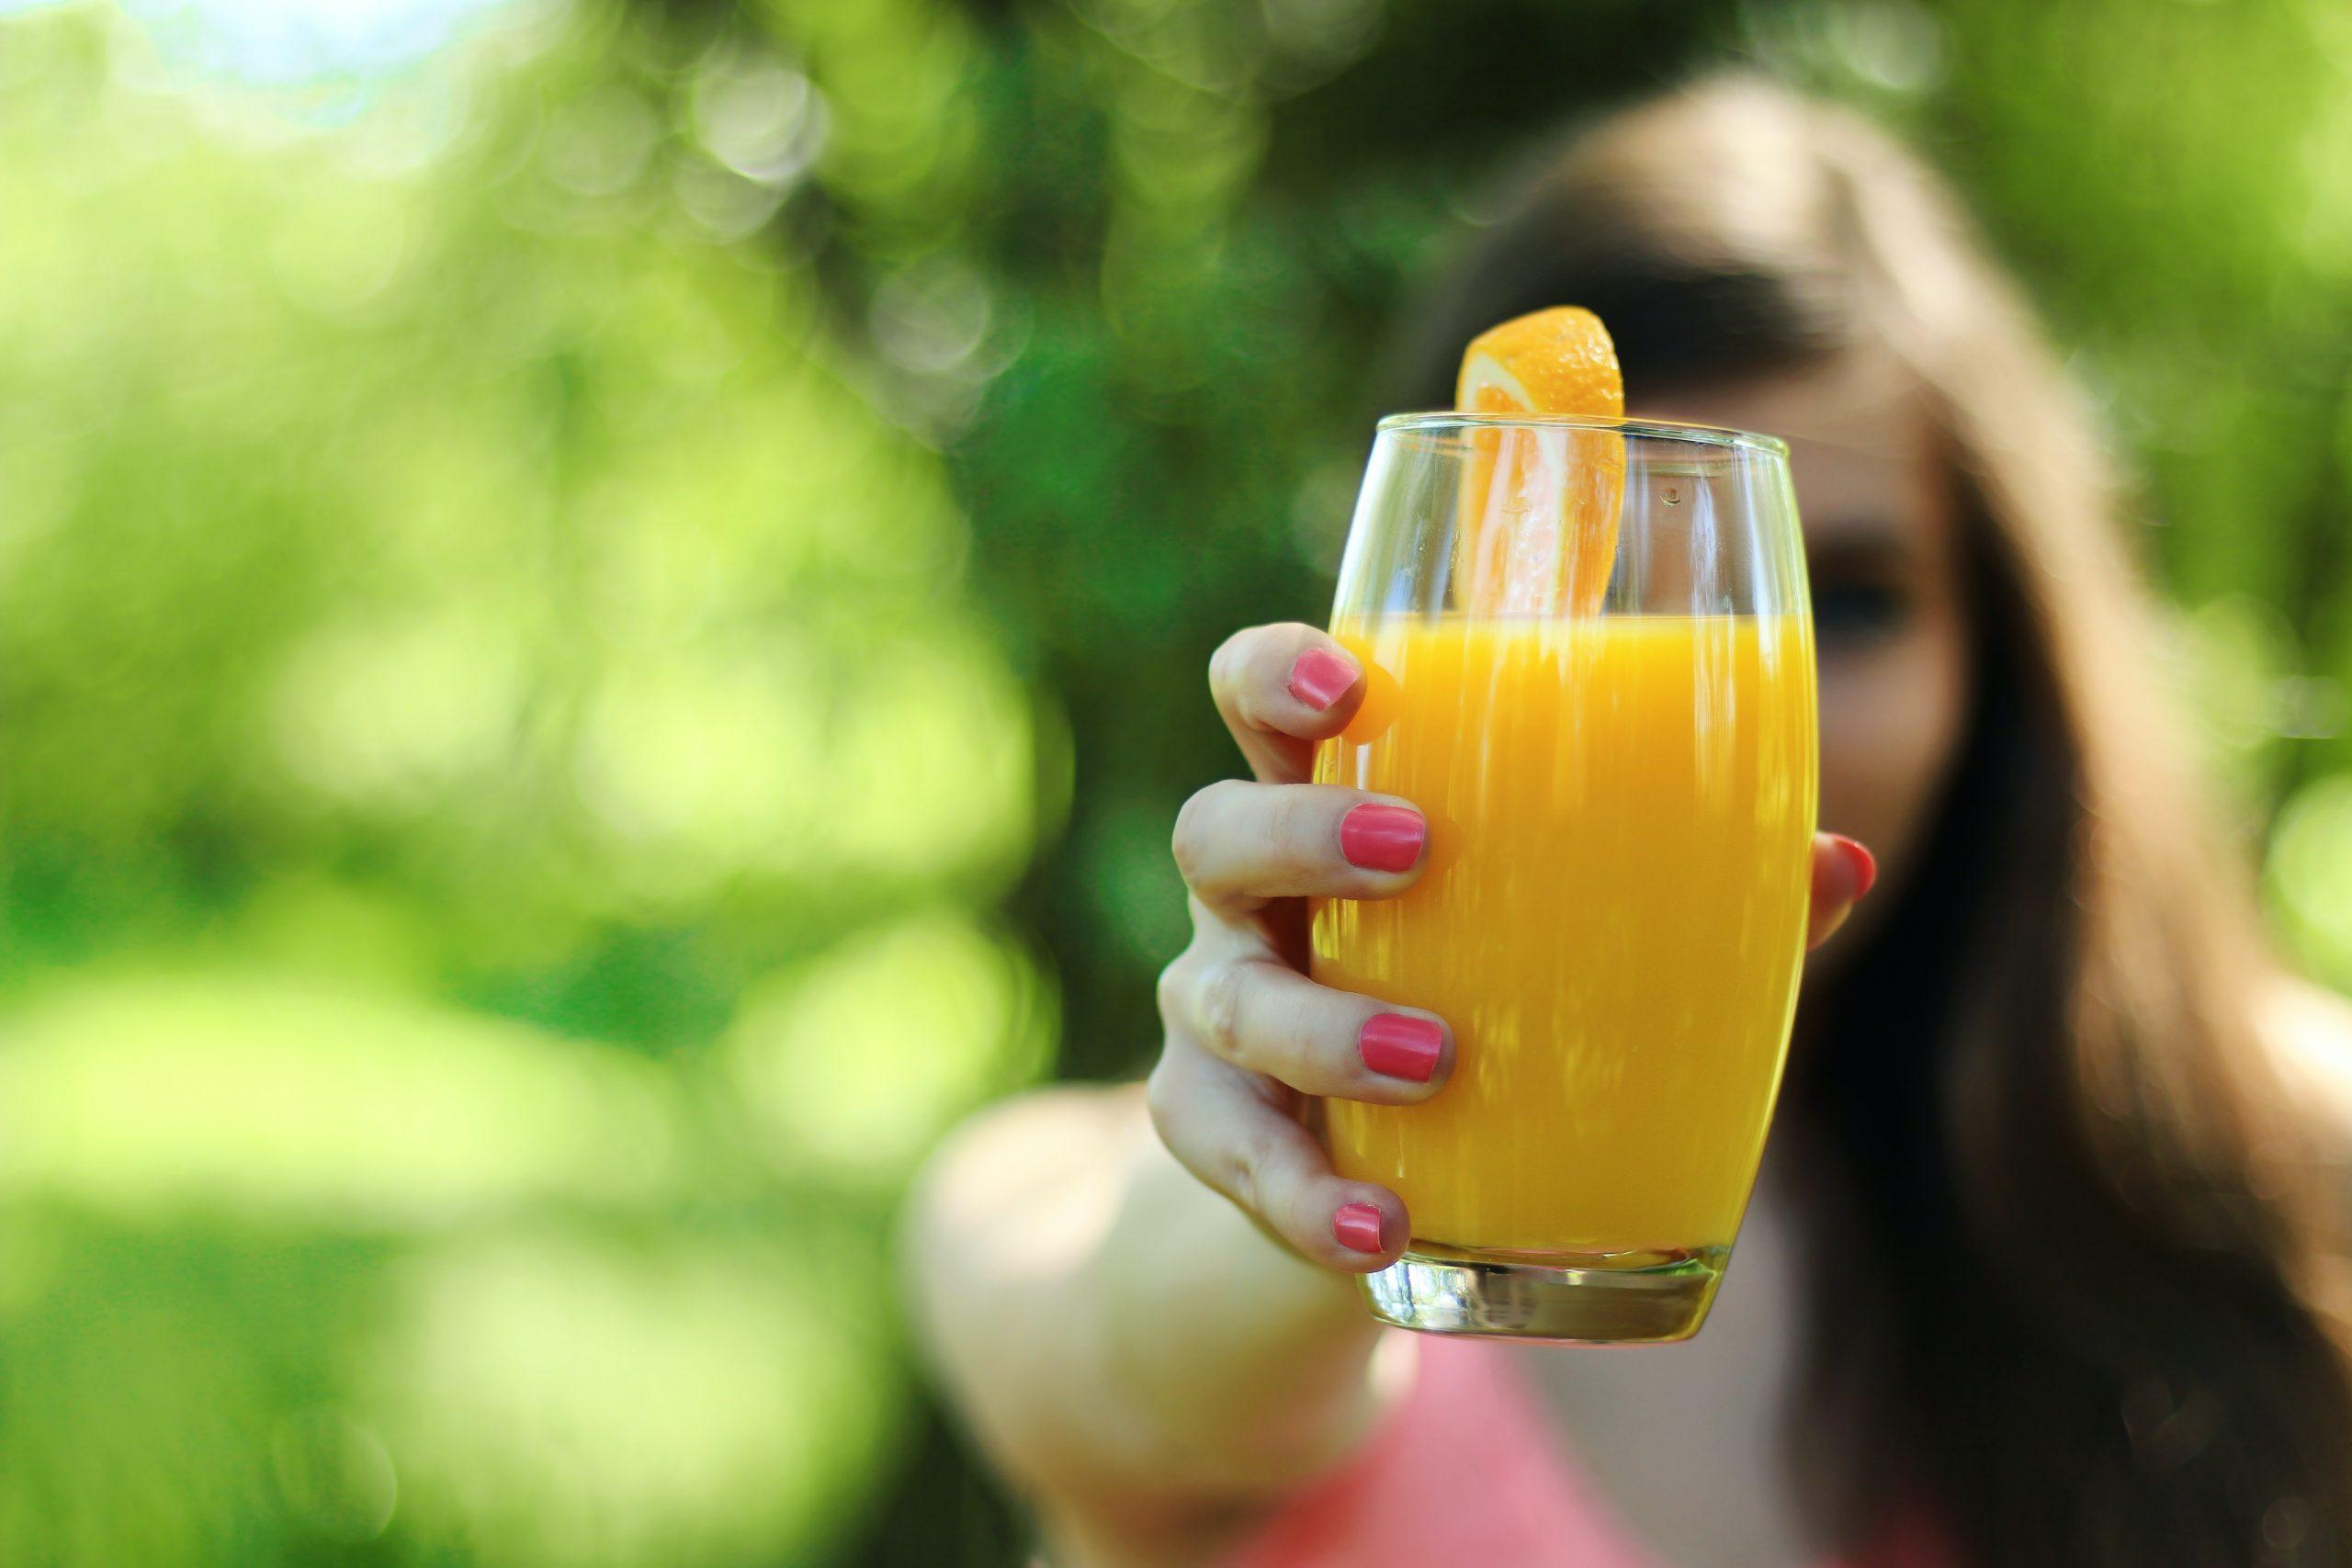 chica mostrando un zumo natural de naranja